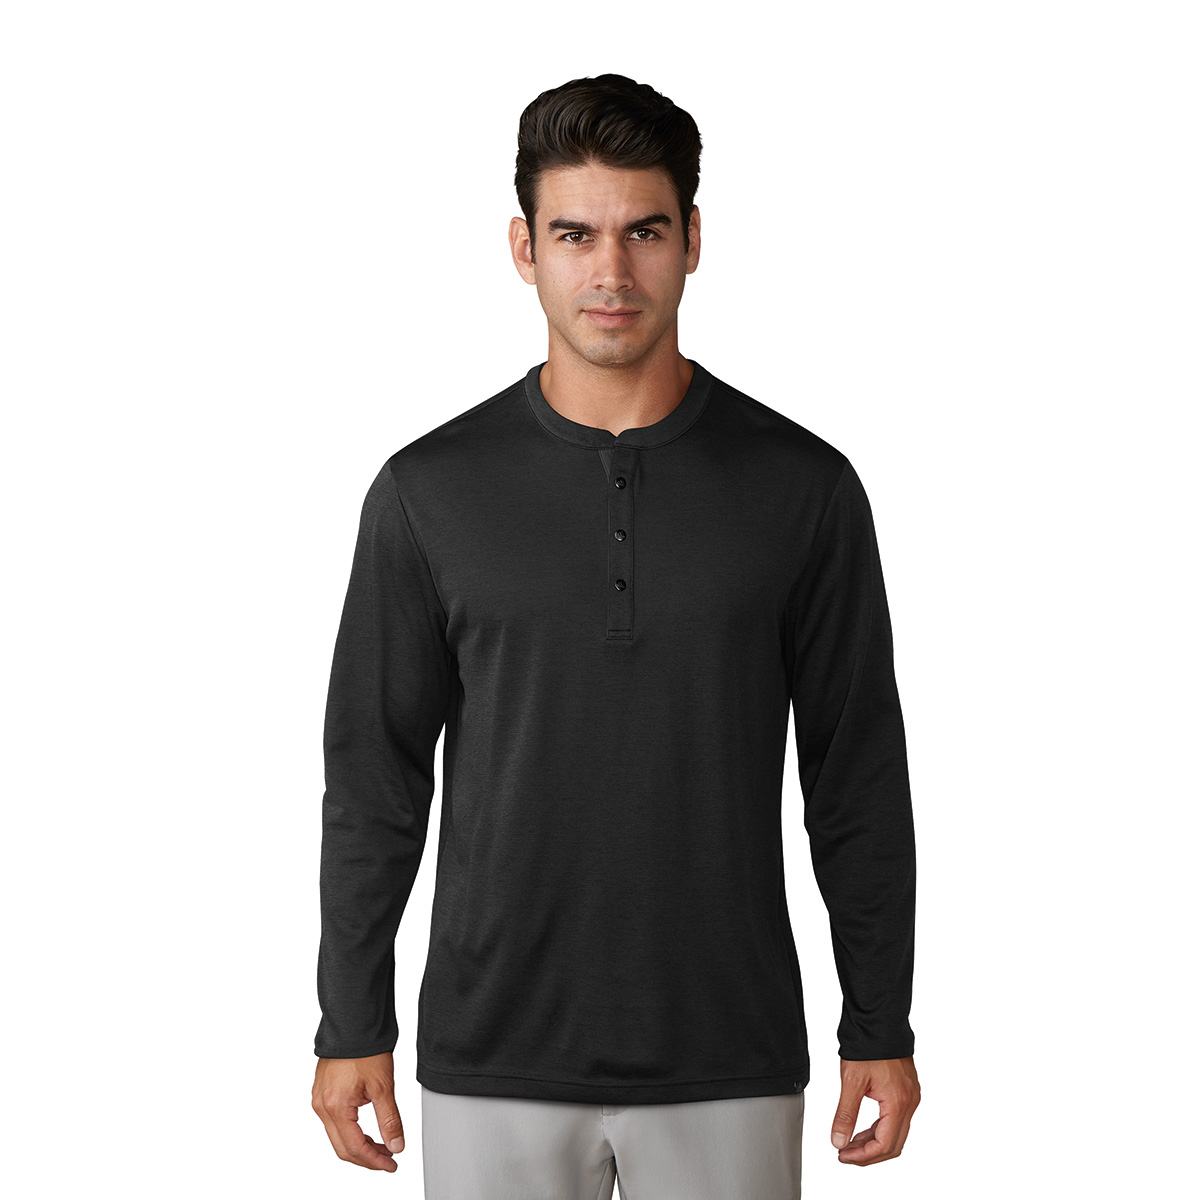 Adidas Men's Adicross No-Show Range Henley Shirt